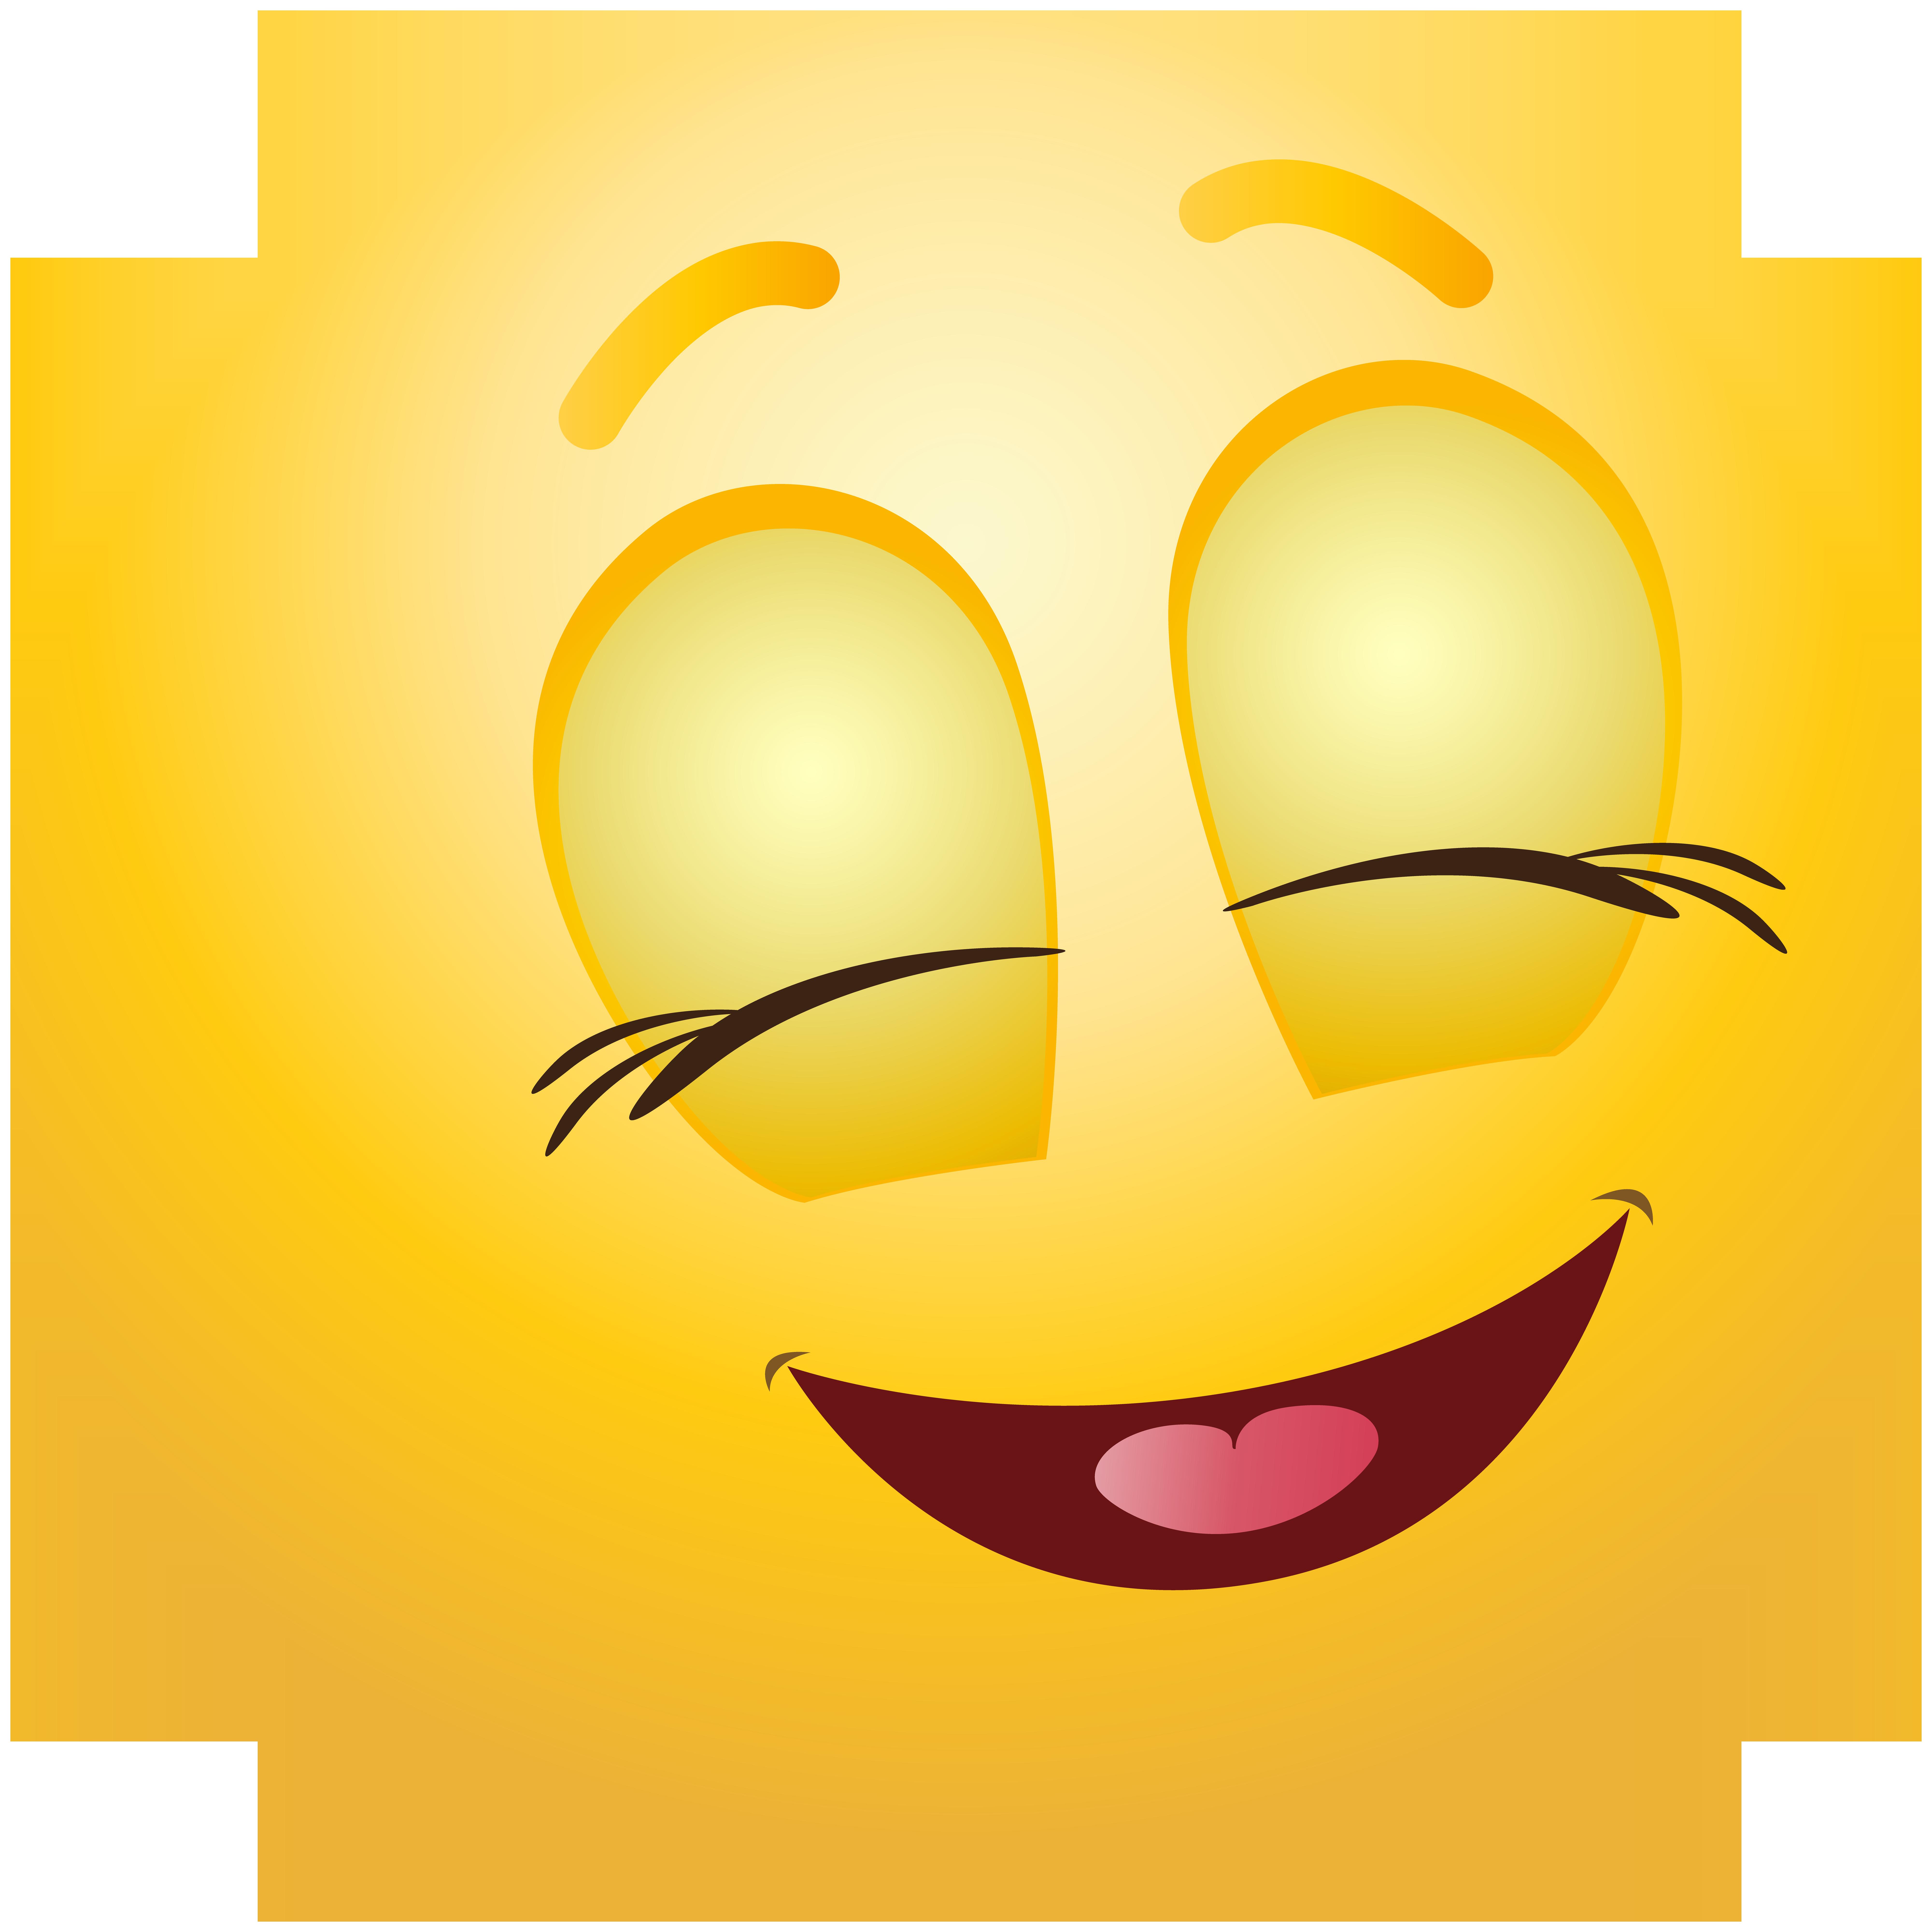 Smiley clipart facial expression. Pleased emoticon png clip